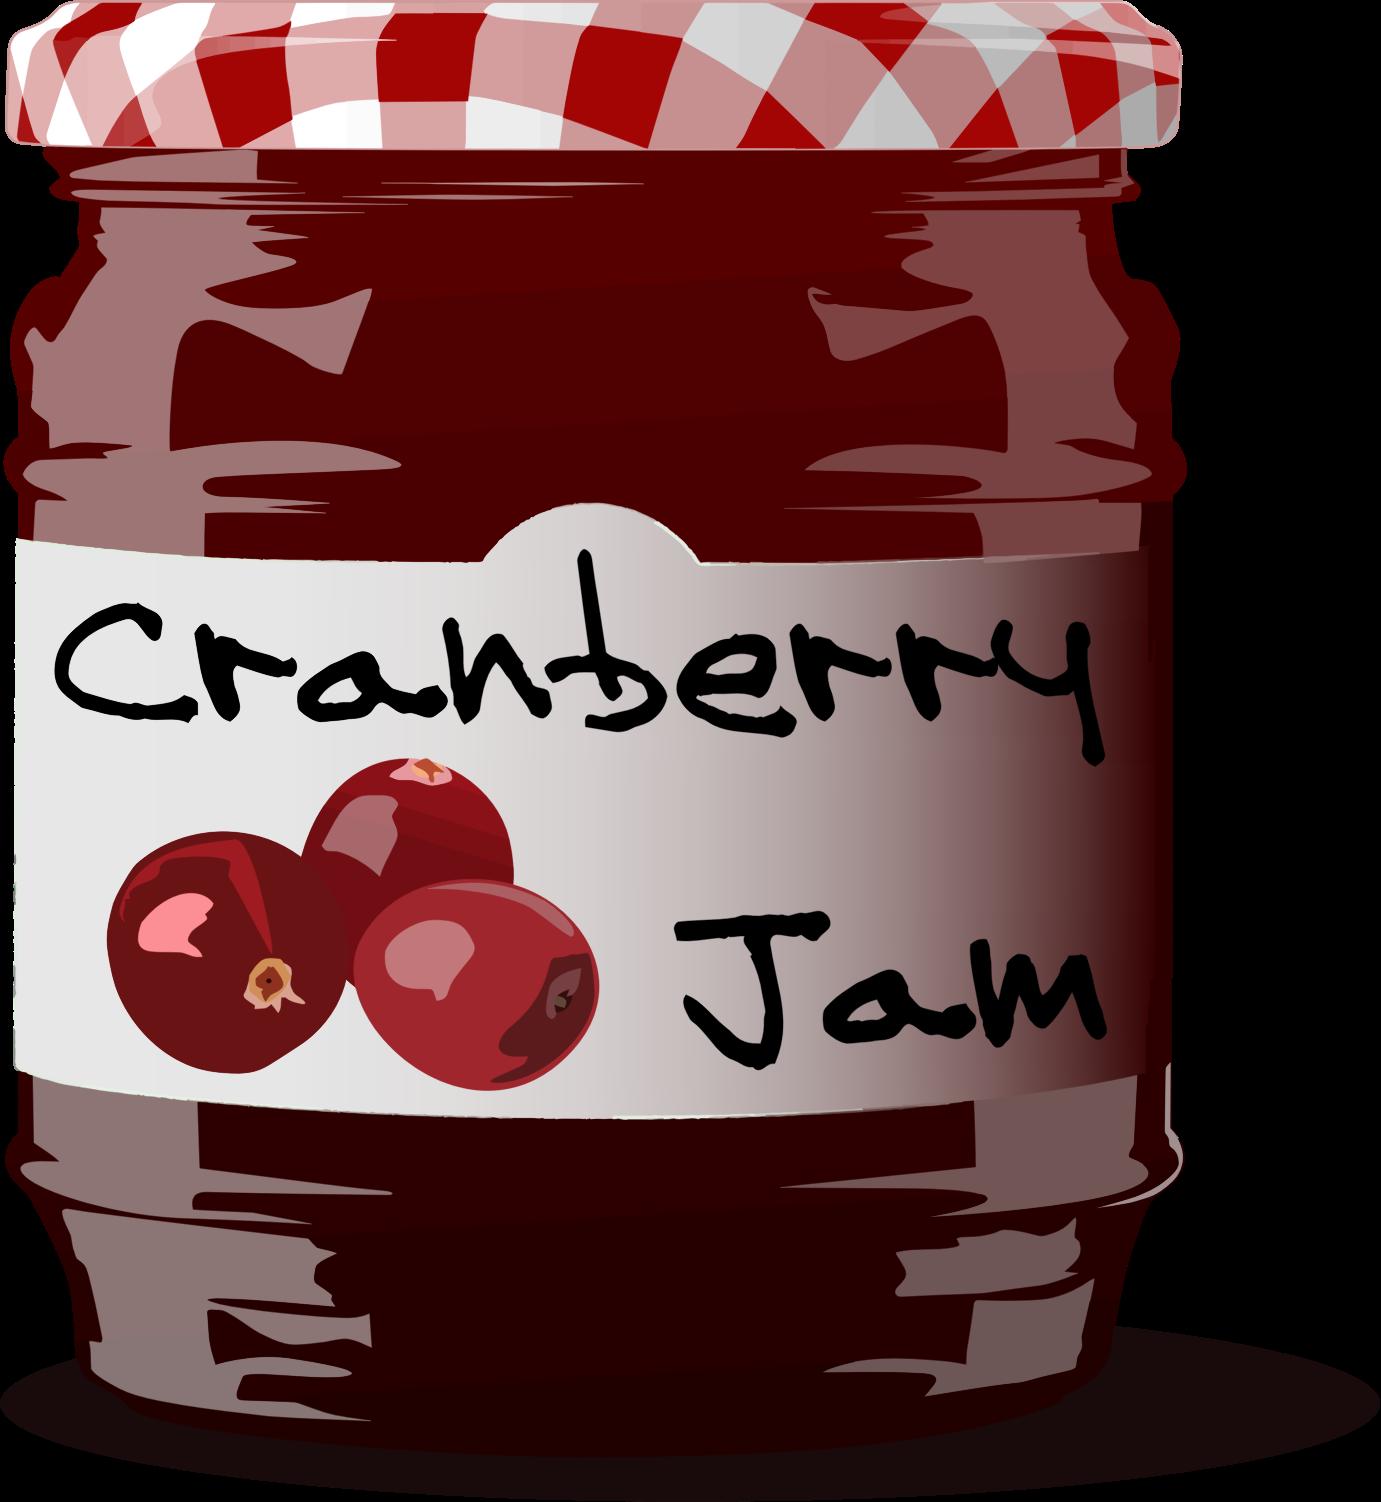 Jar clipart jam jar Cranberry Jam Jam Clipart Cranberry